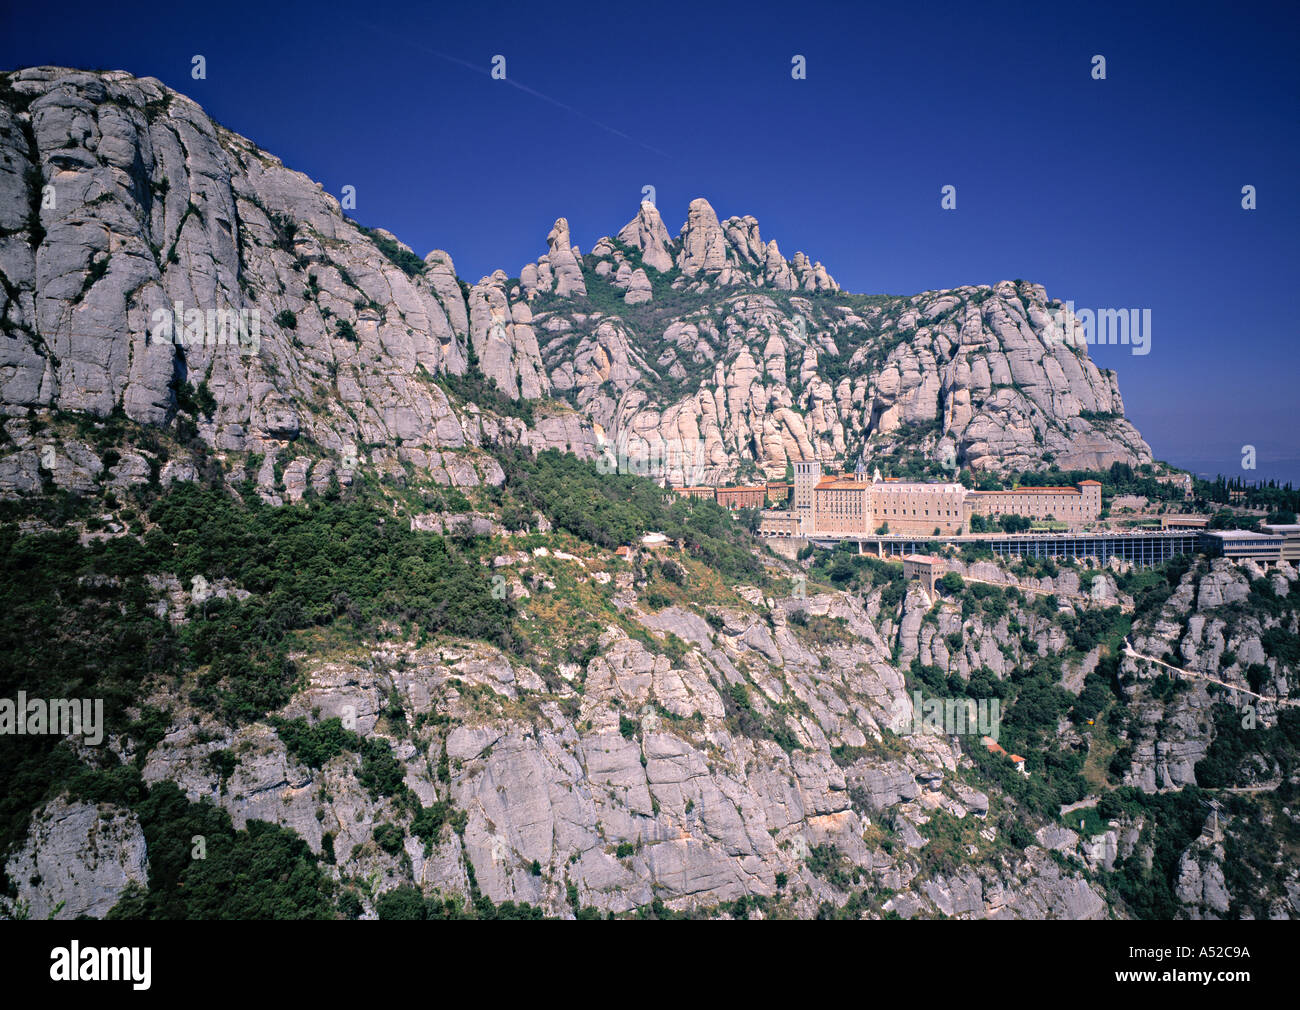 Monasterio de Monserrat, en Cataluña, España Imagen De Stock